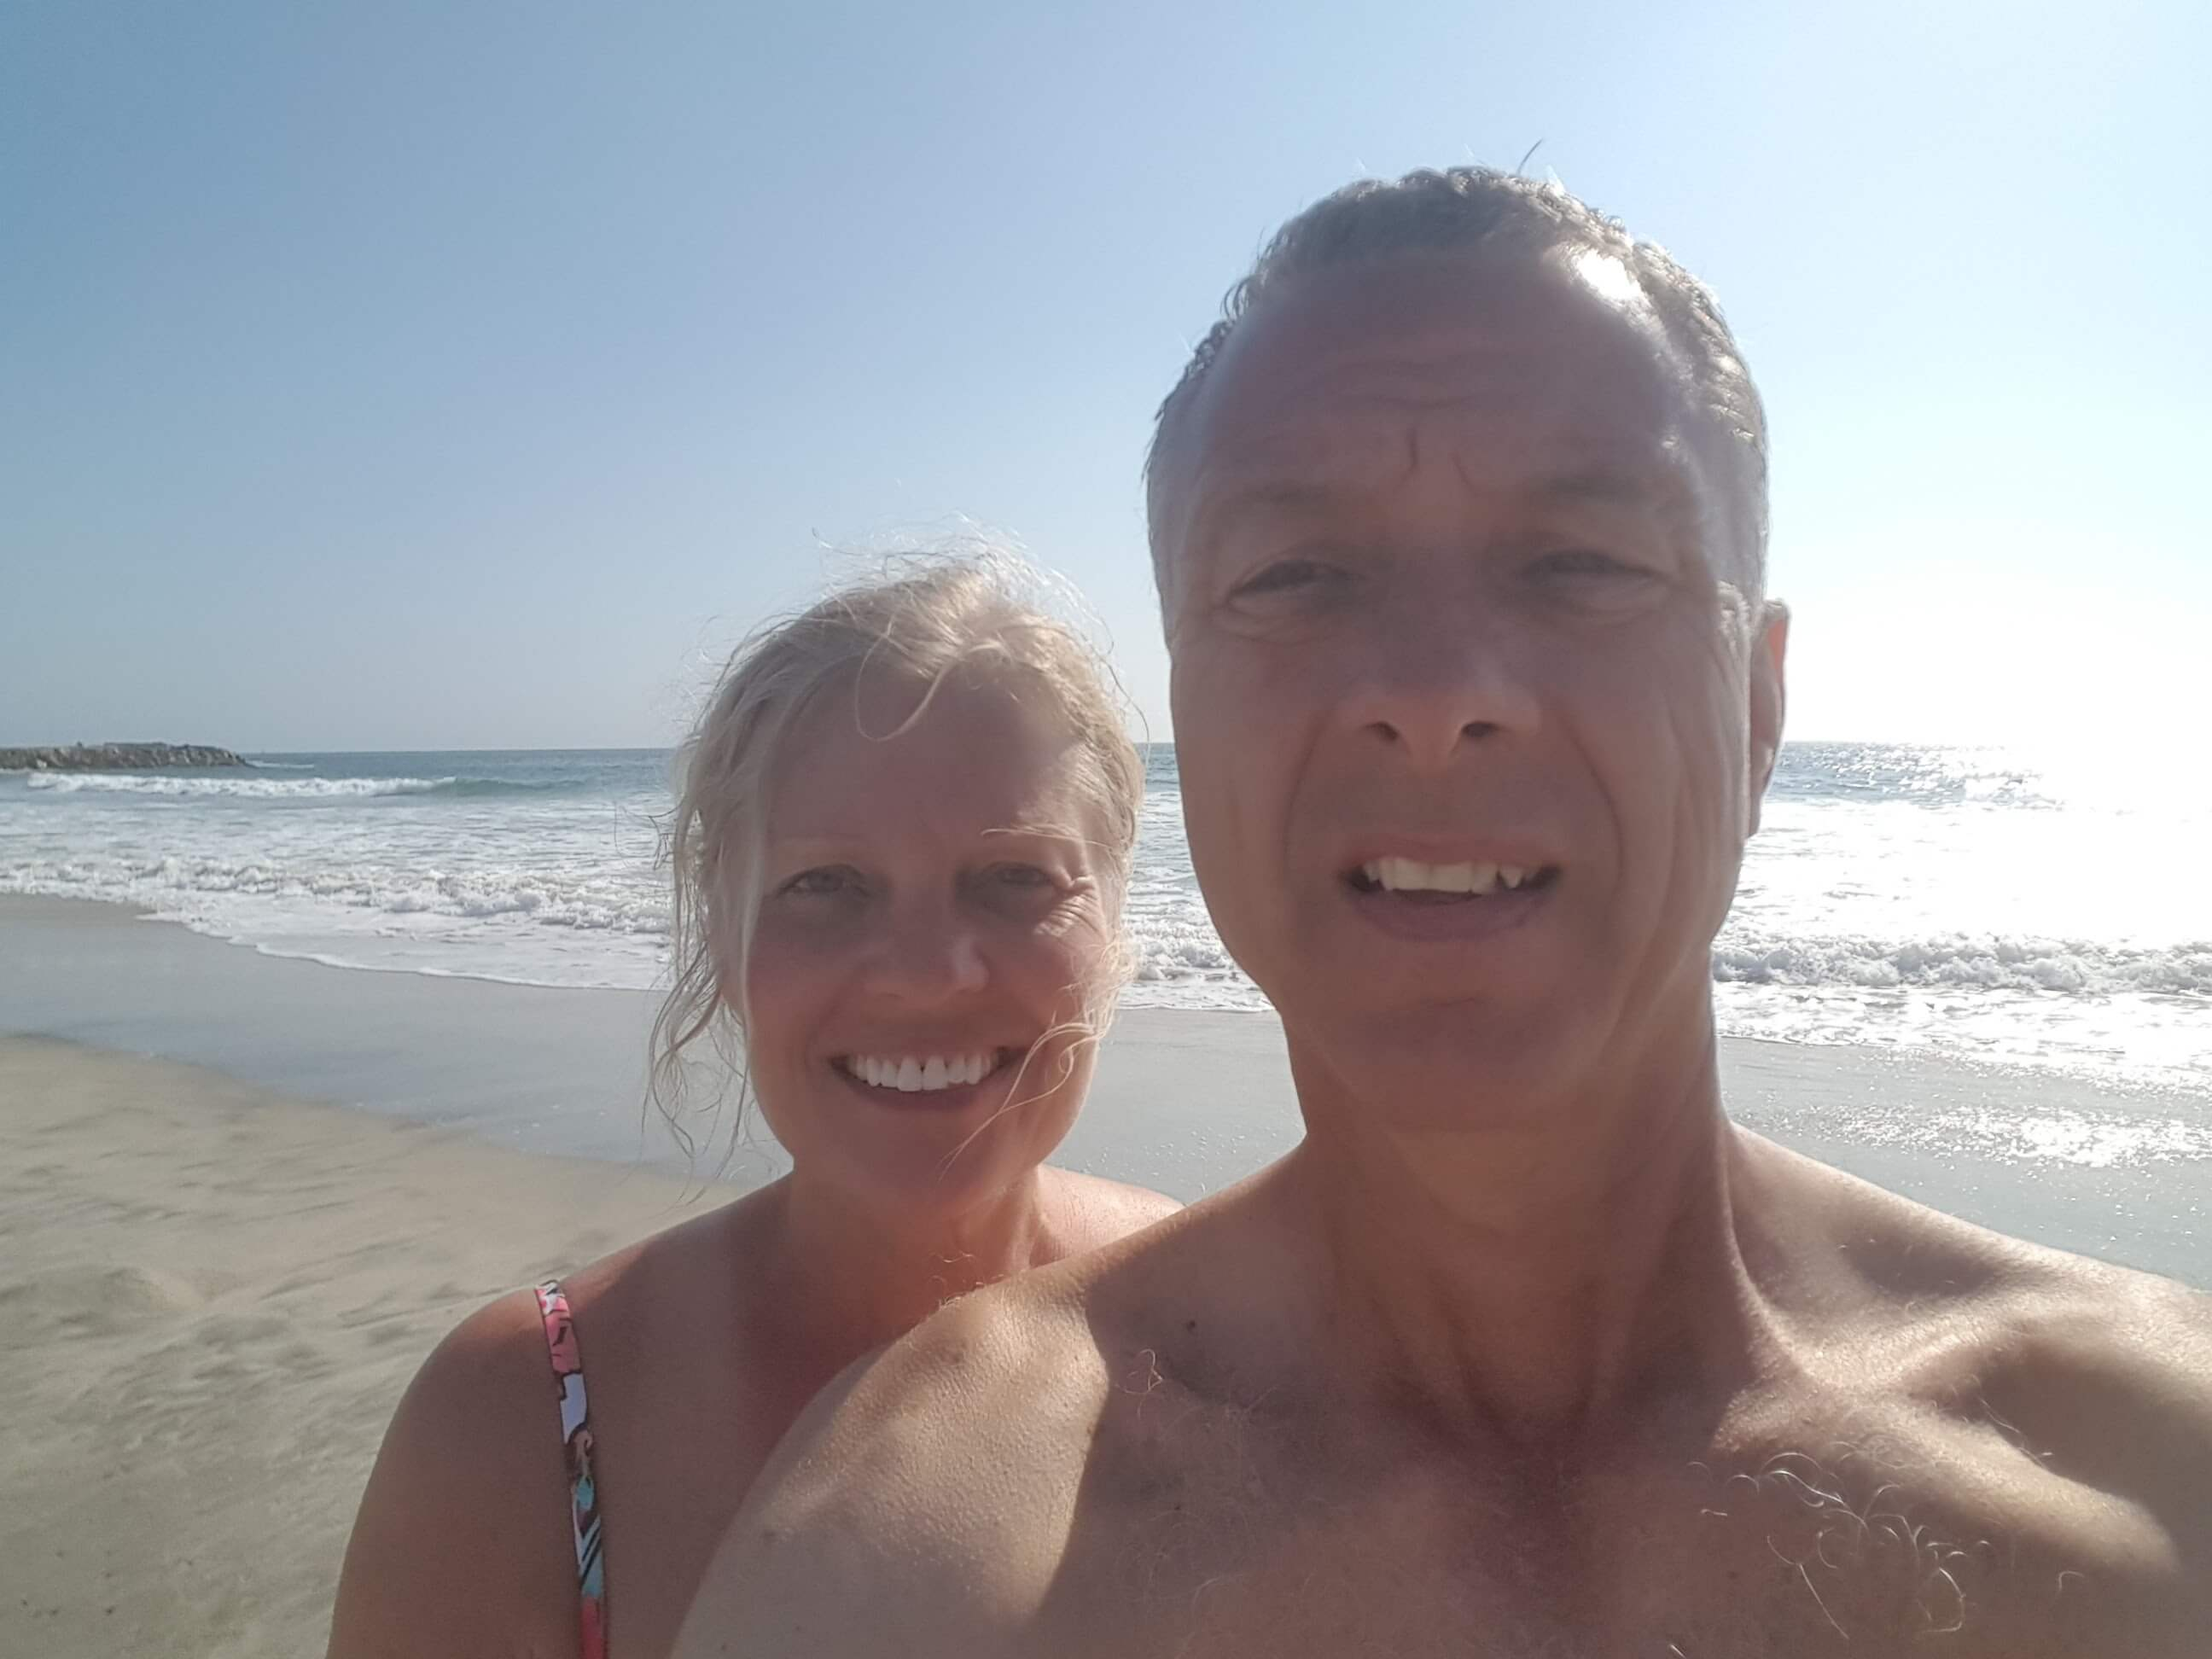 Beach time on Camp Pendleton